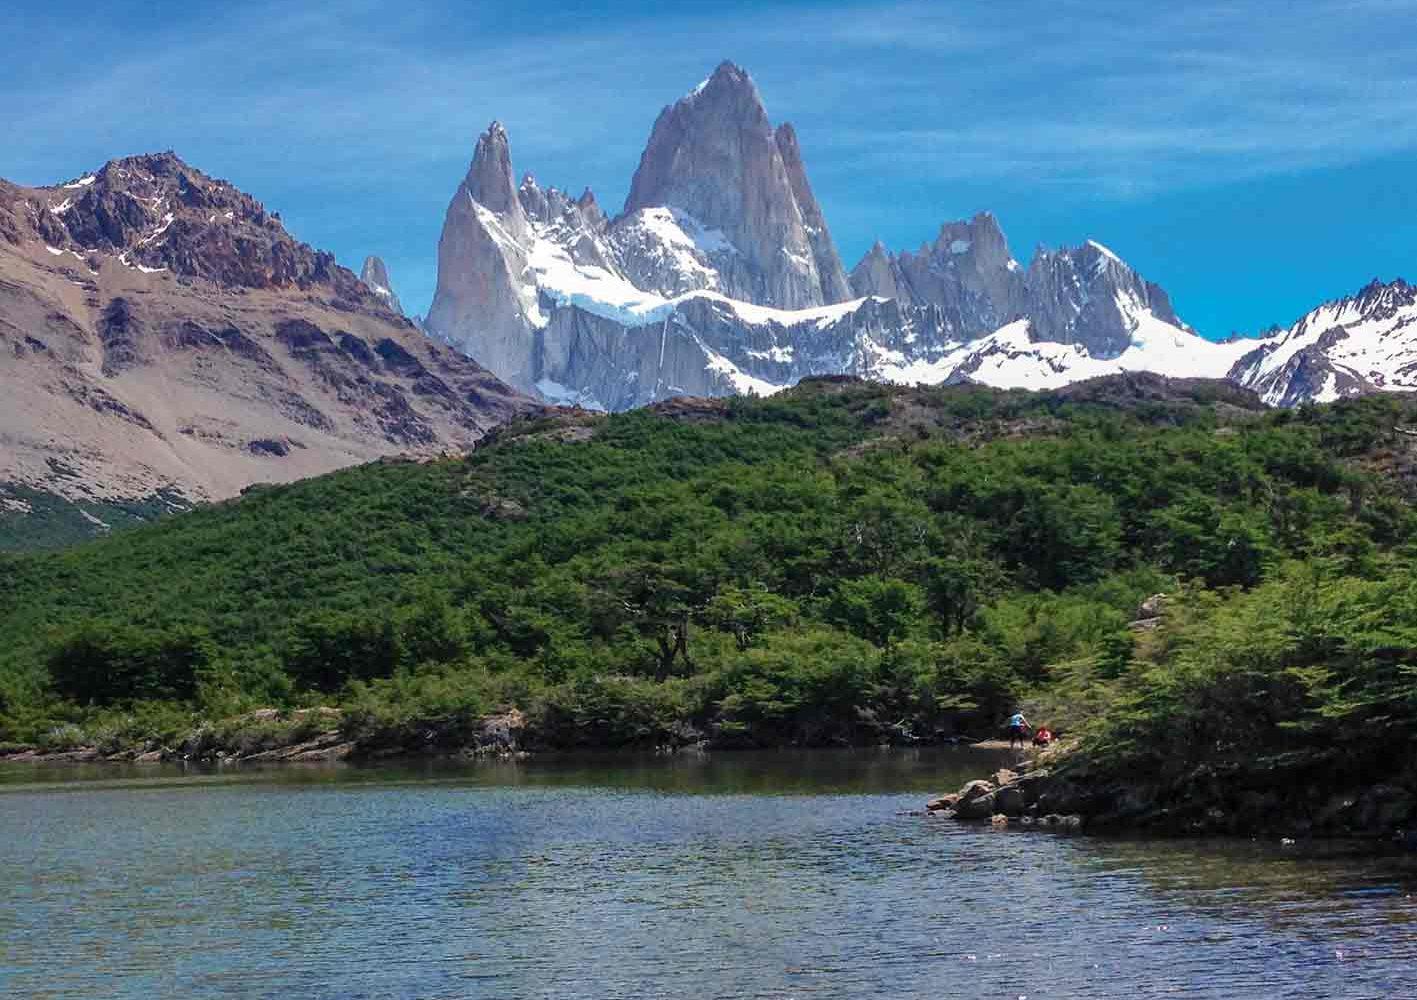 Laguna Capri, Blick auf Fitz Roy, Patagonien, Argentinien